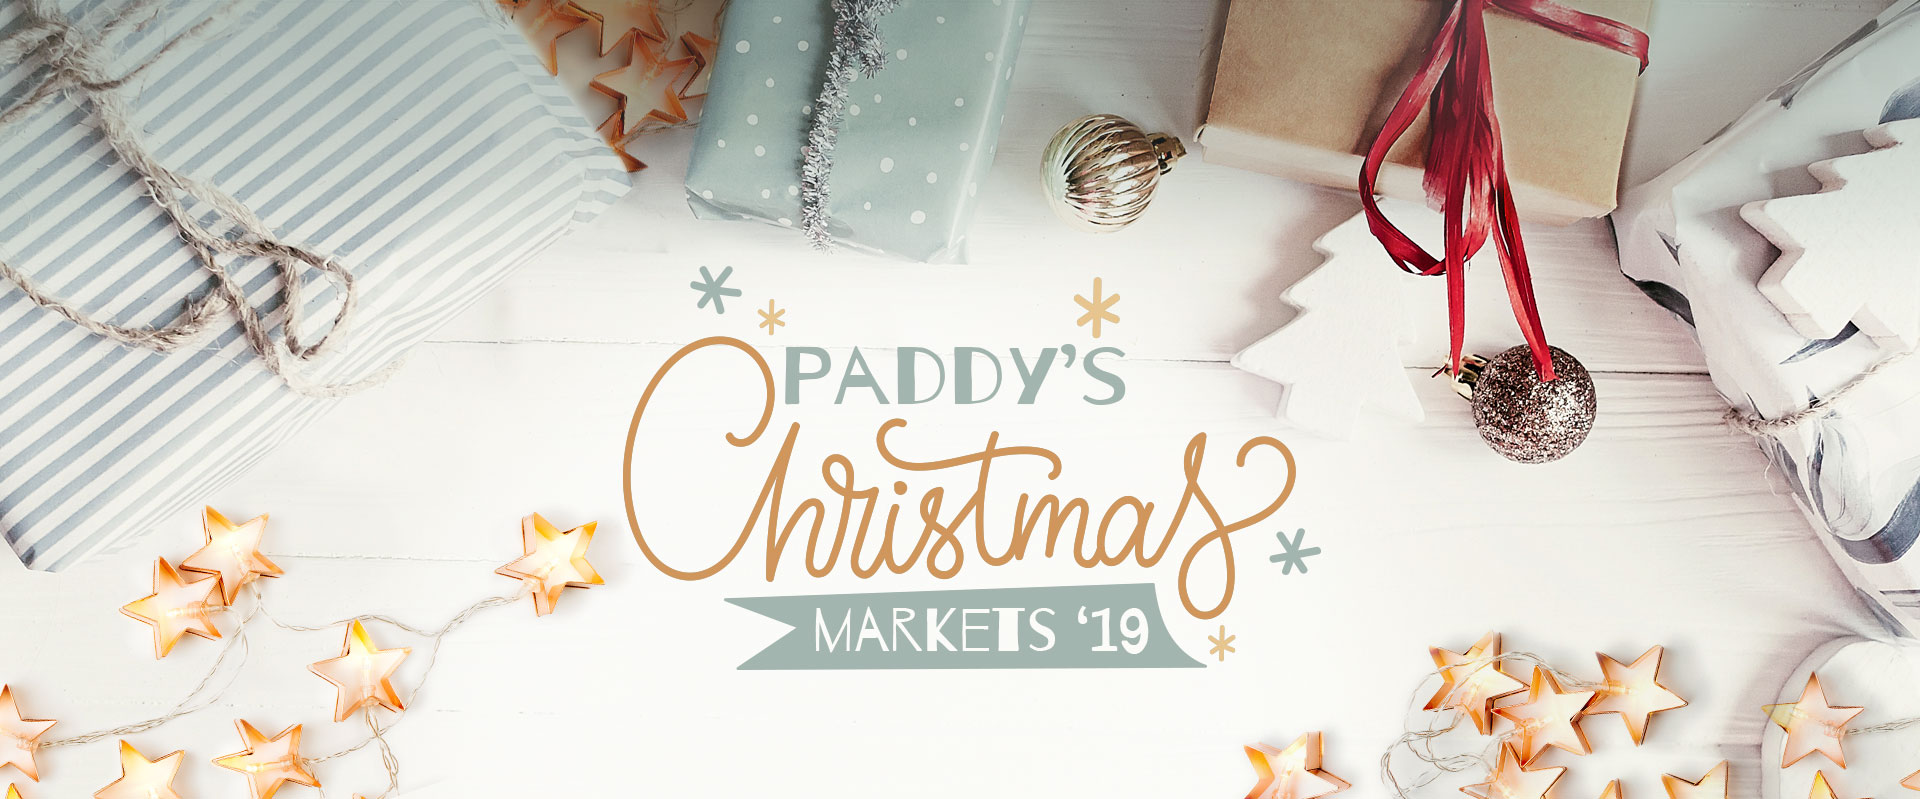 Trade at Paddy's Markets this Christmas 2019